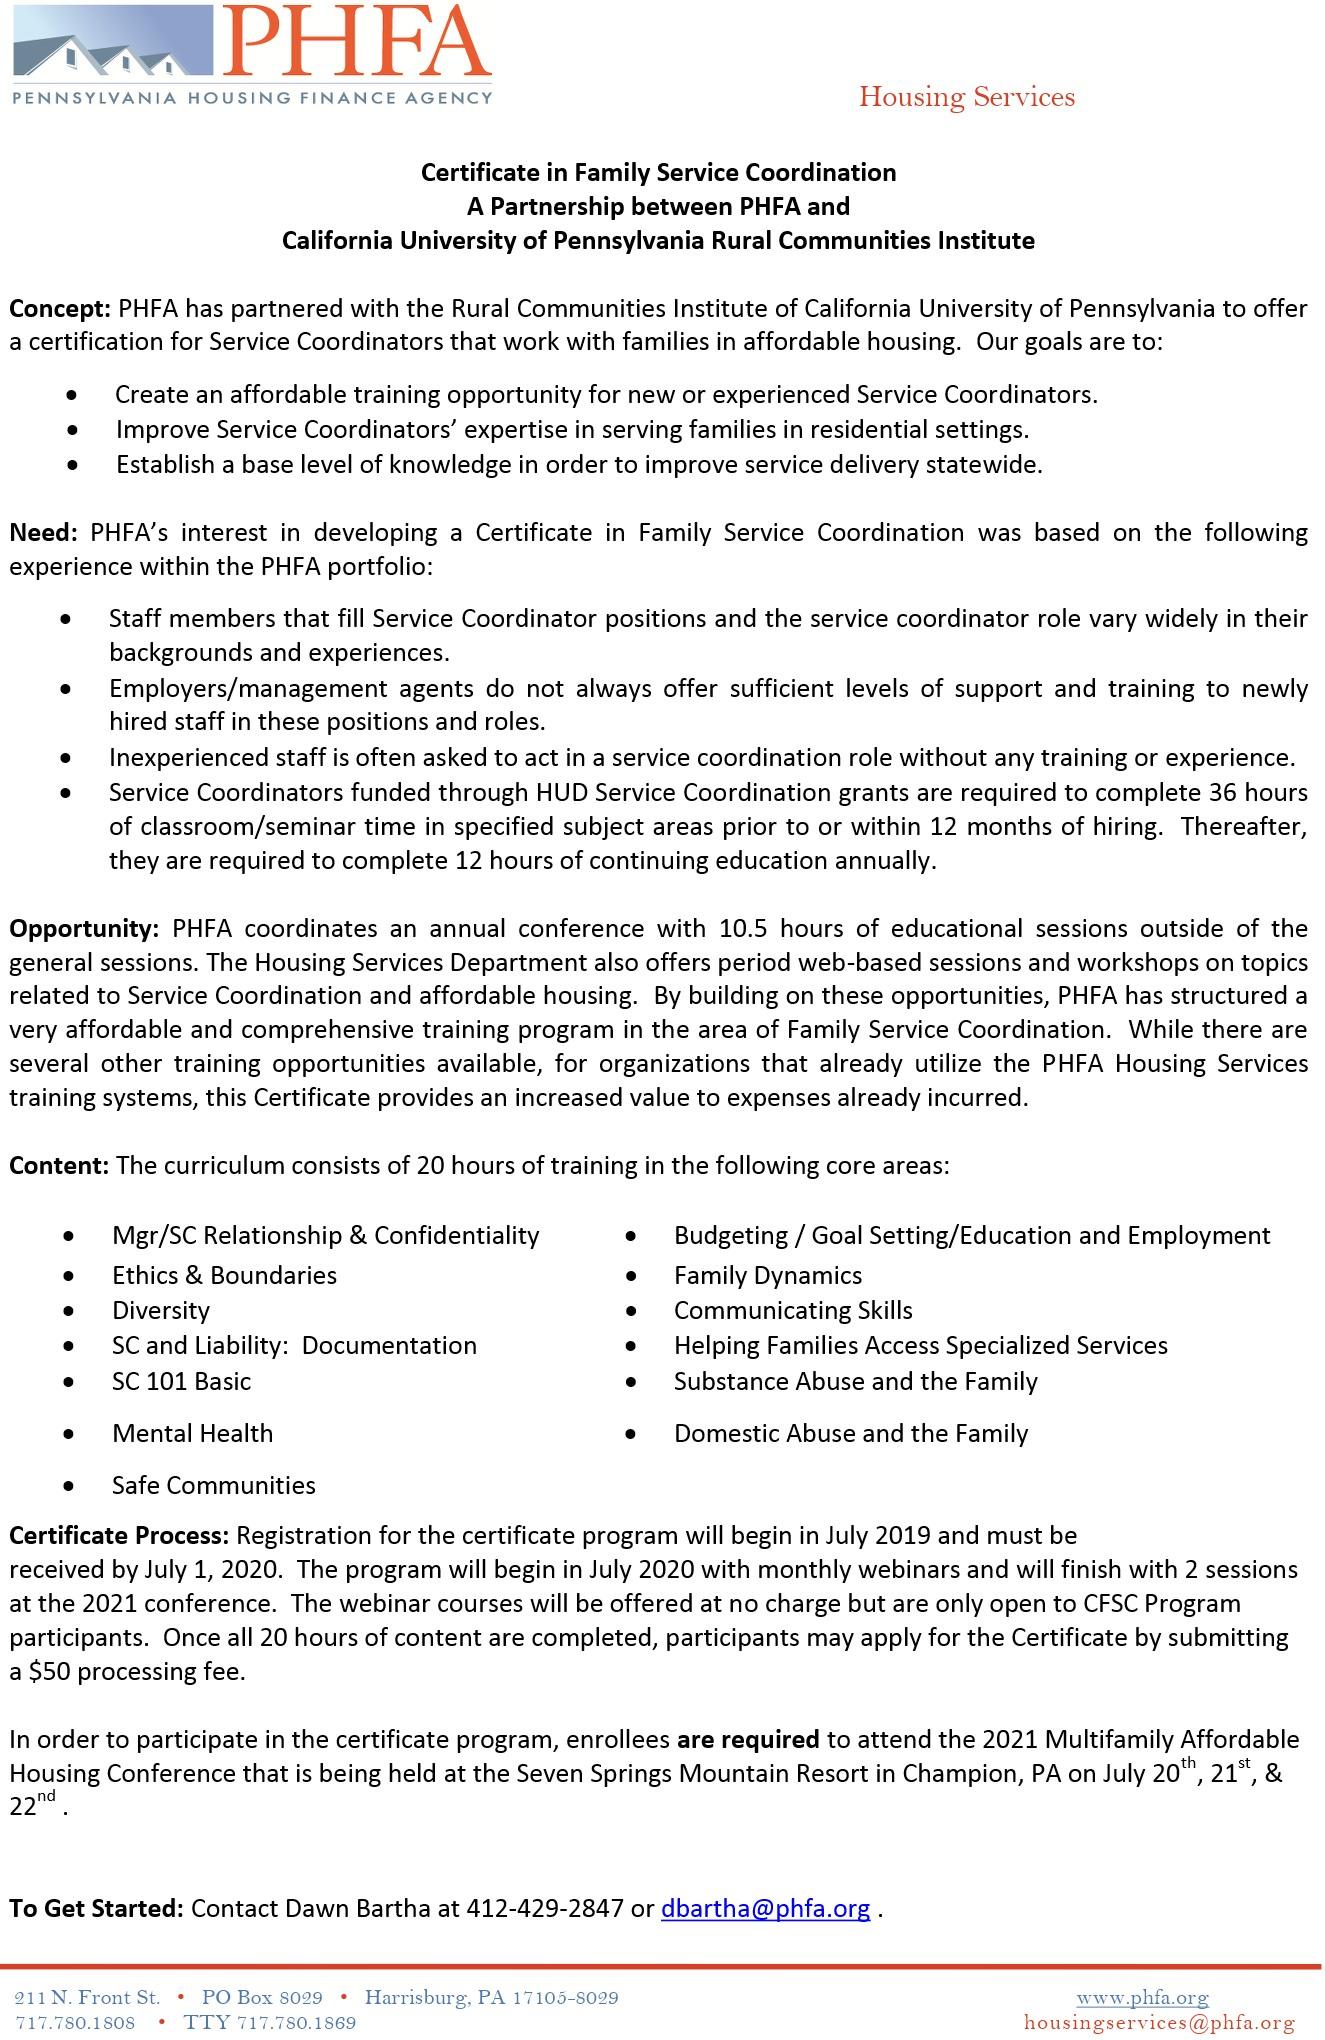 PHFA 2020 CFSC Information Updated